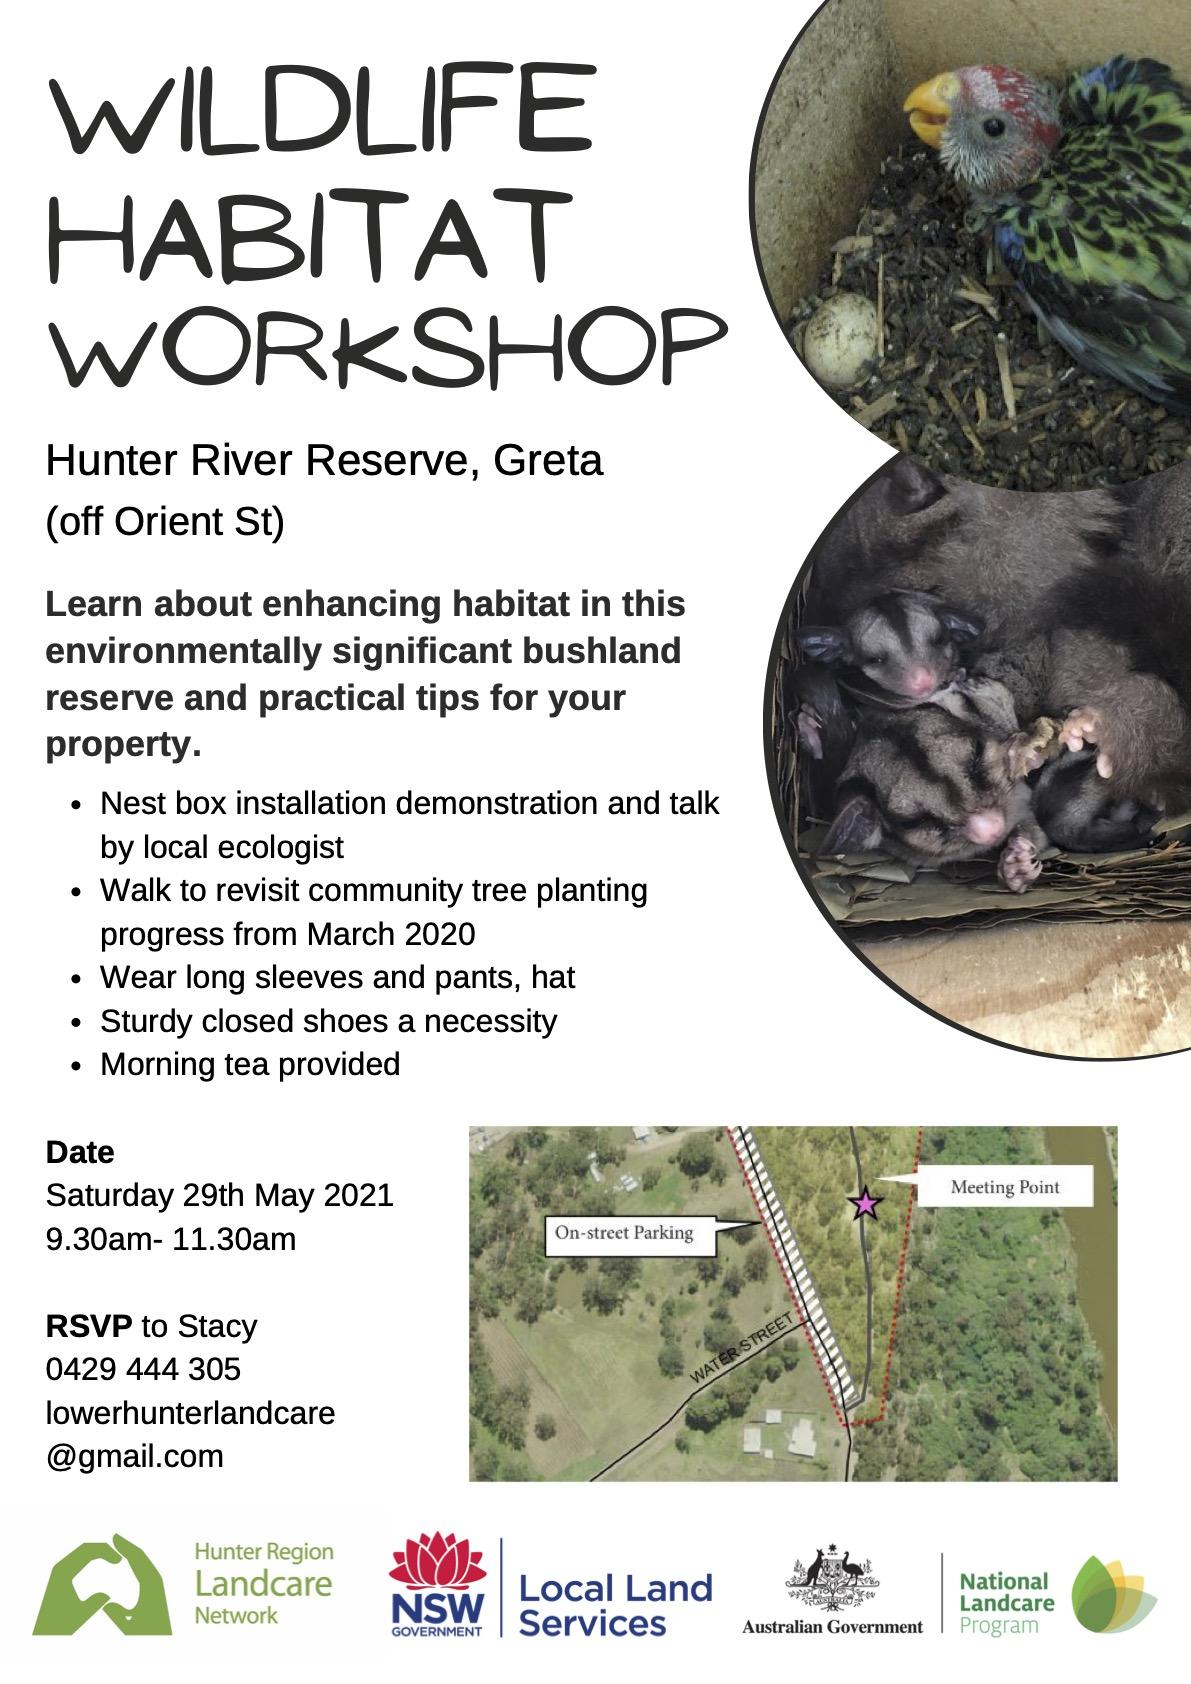 Wildlife-Habitat-Workshop-Greta